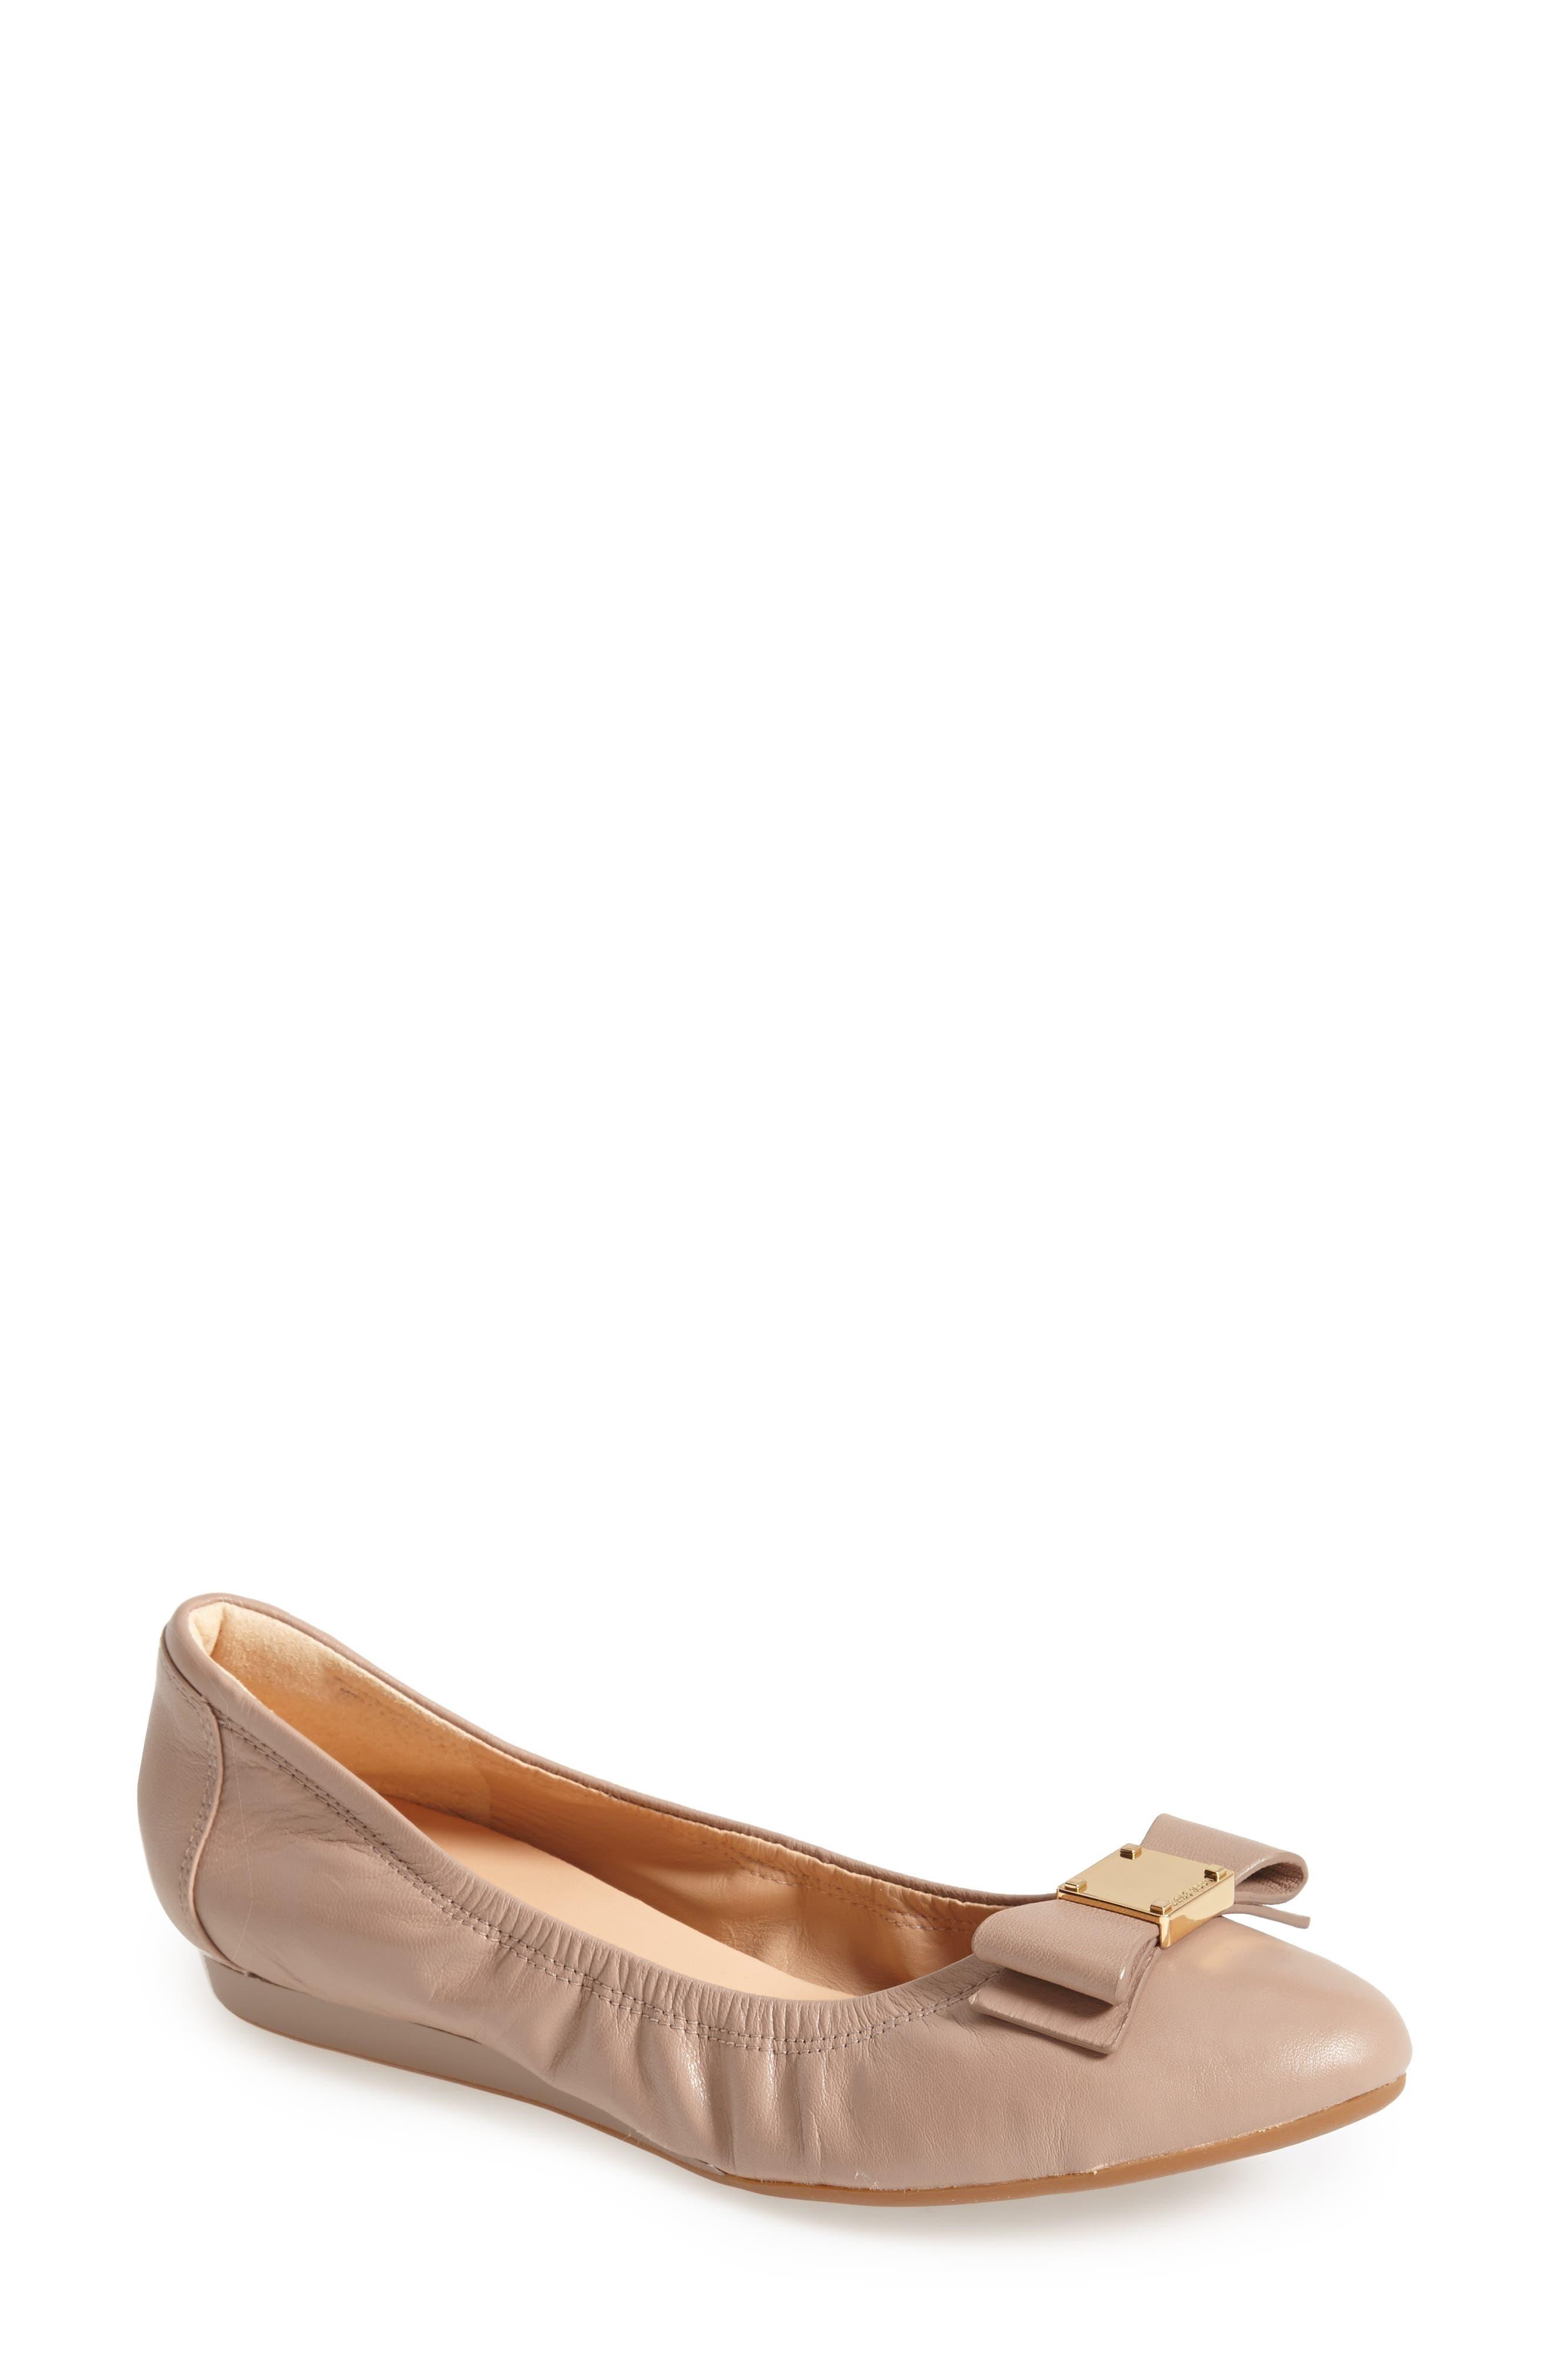 'Tali' Bow Ballet Flat,                         Main,                         color, Maple Sugar